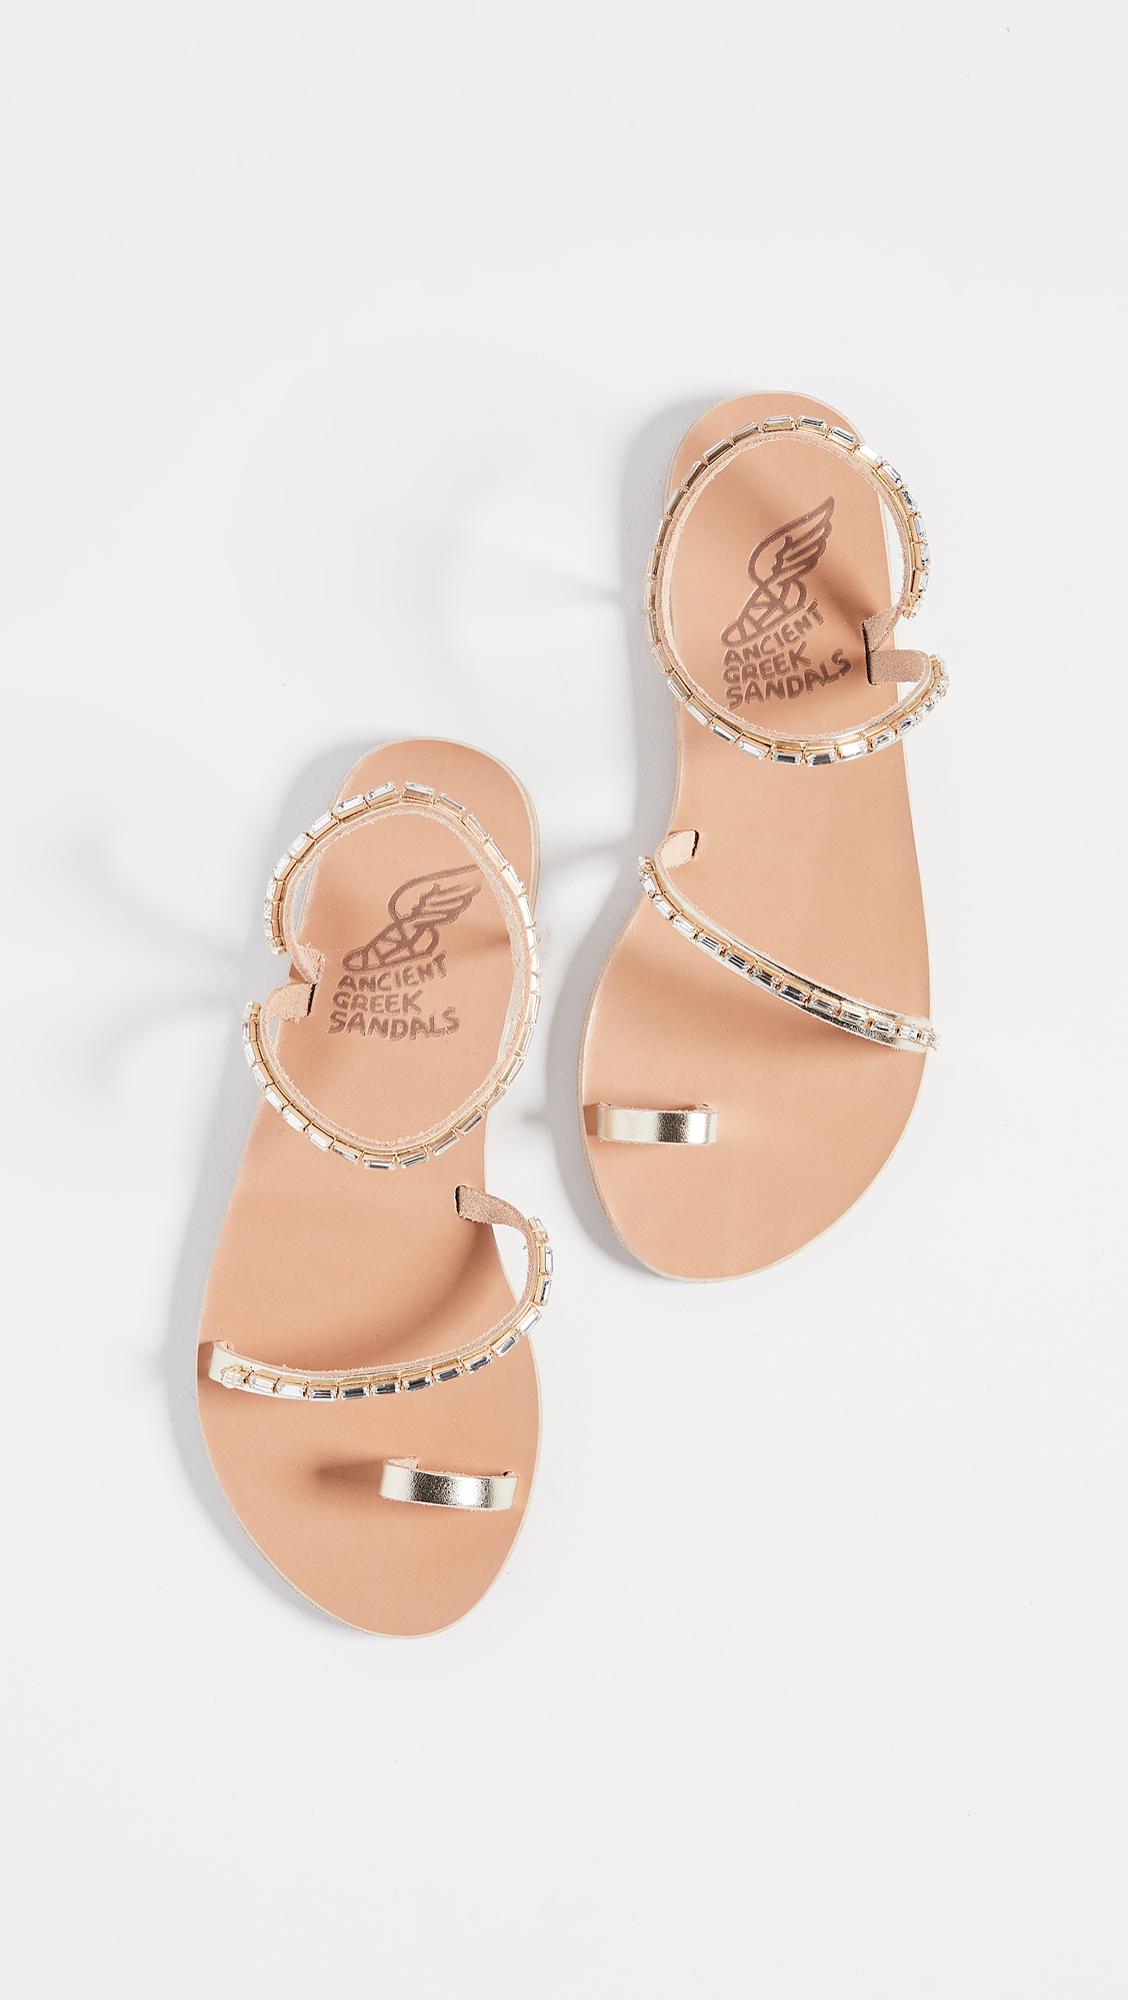 bc2d9144c Ancient Greek Sandals Apli Eleftheria Diamonds Sandals